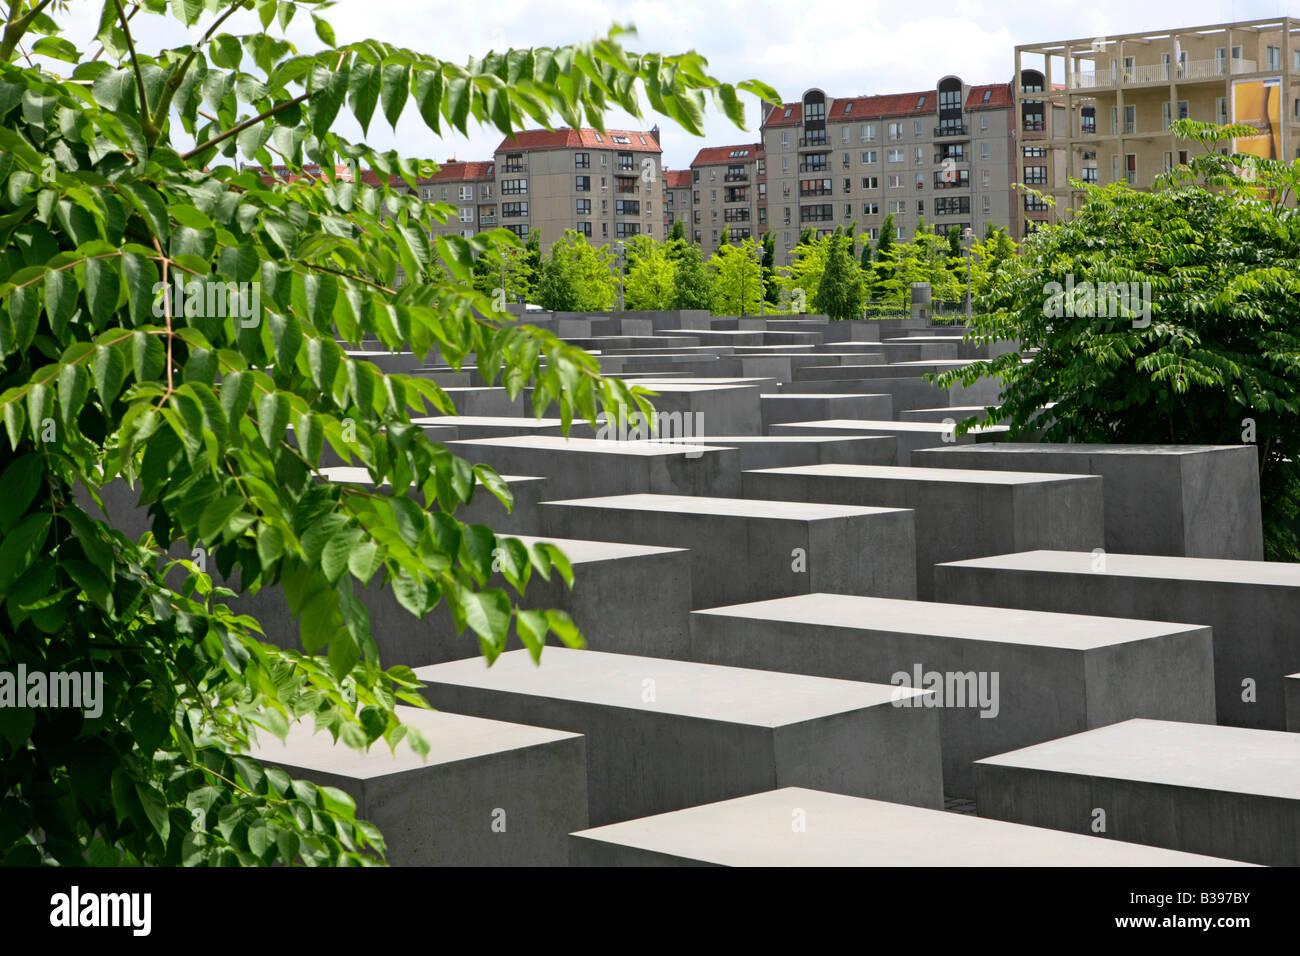 Deutschland, Berlin, Holocaust-Mahnmal, Germany Holocaust Memorial in Berlin Stock Photo